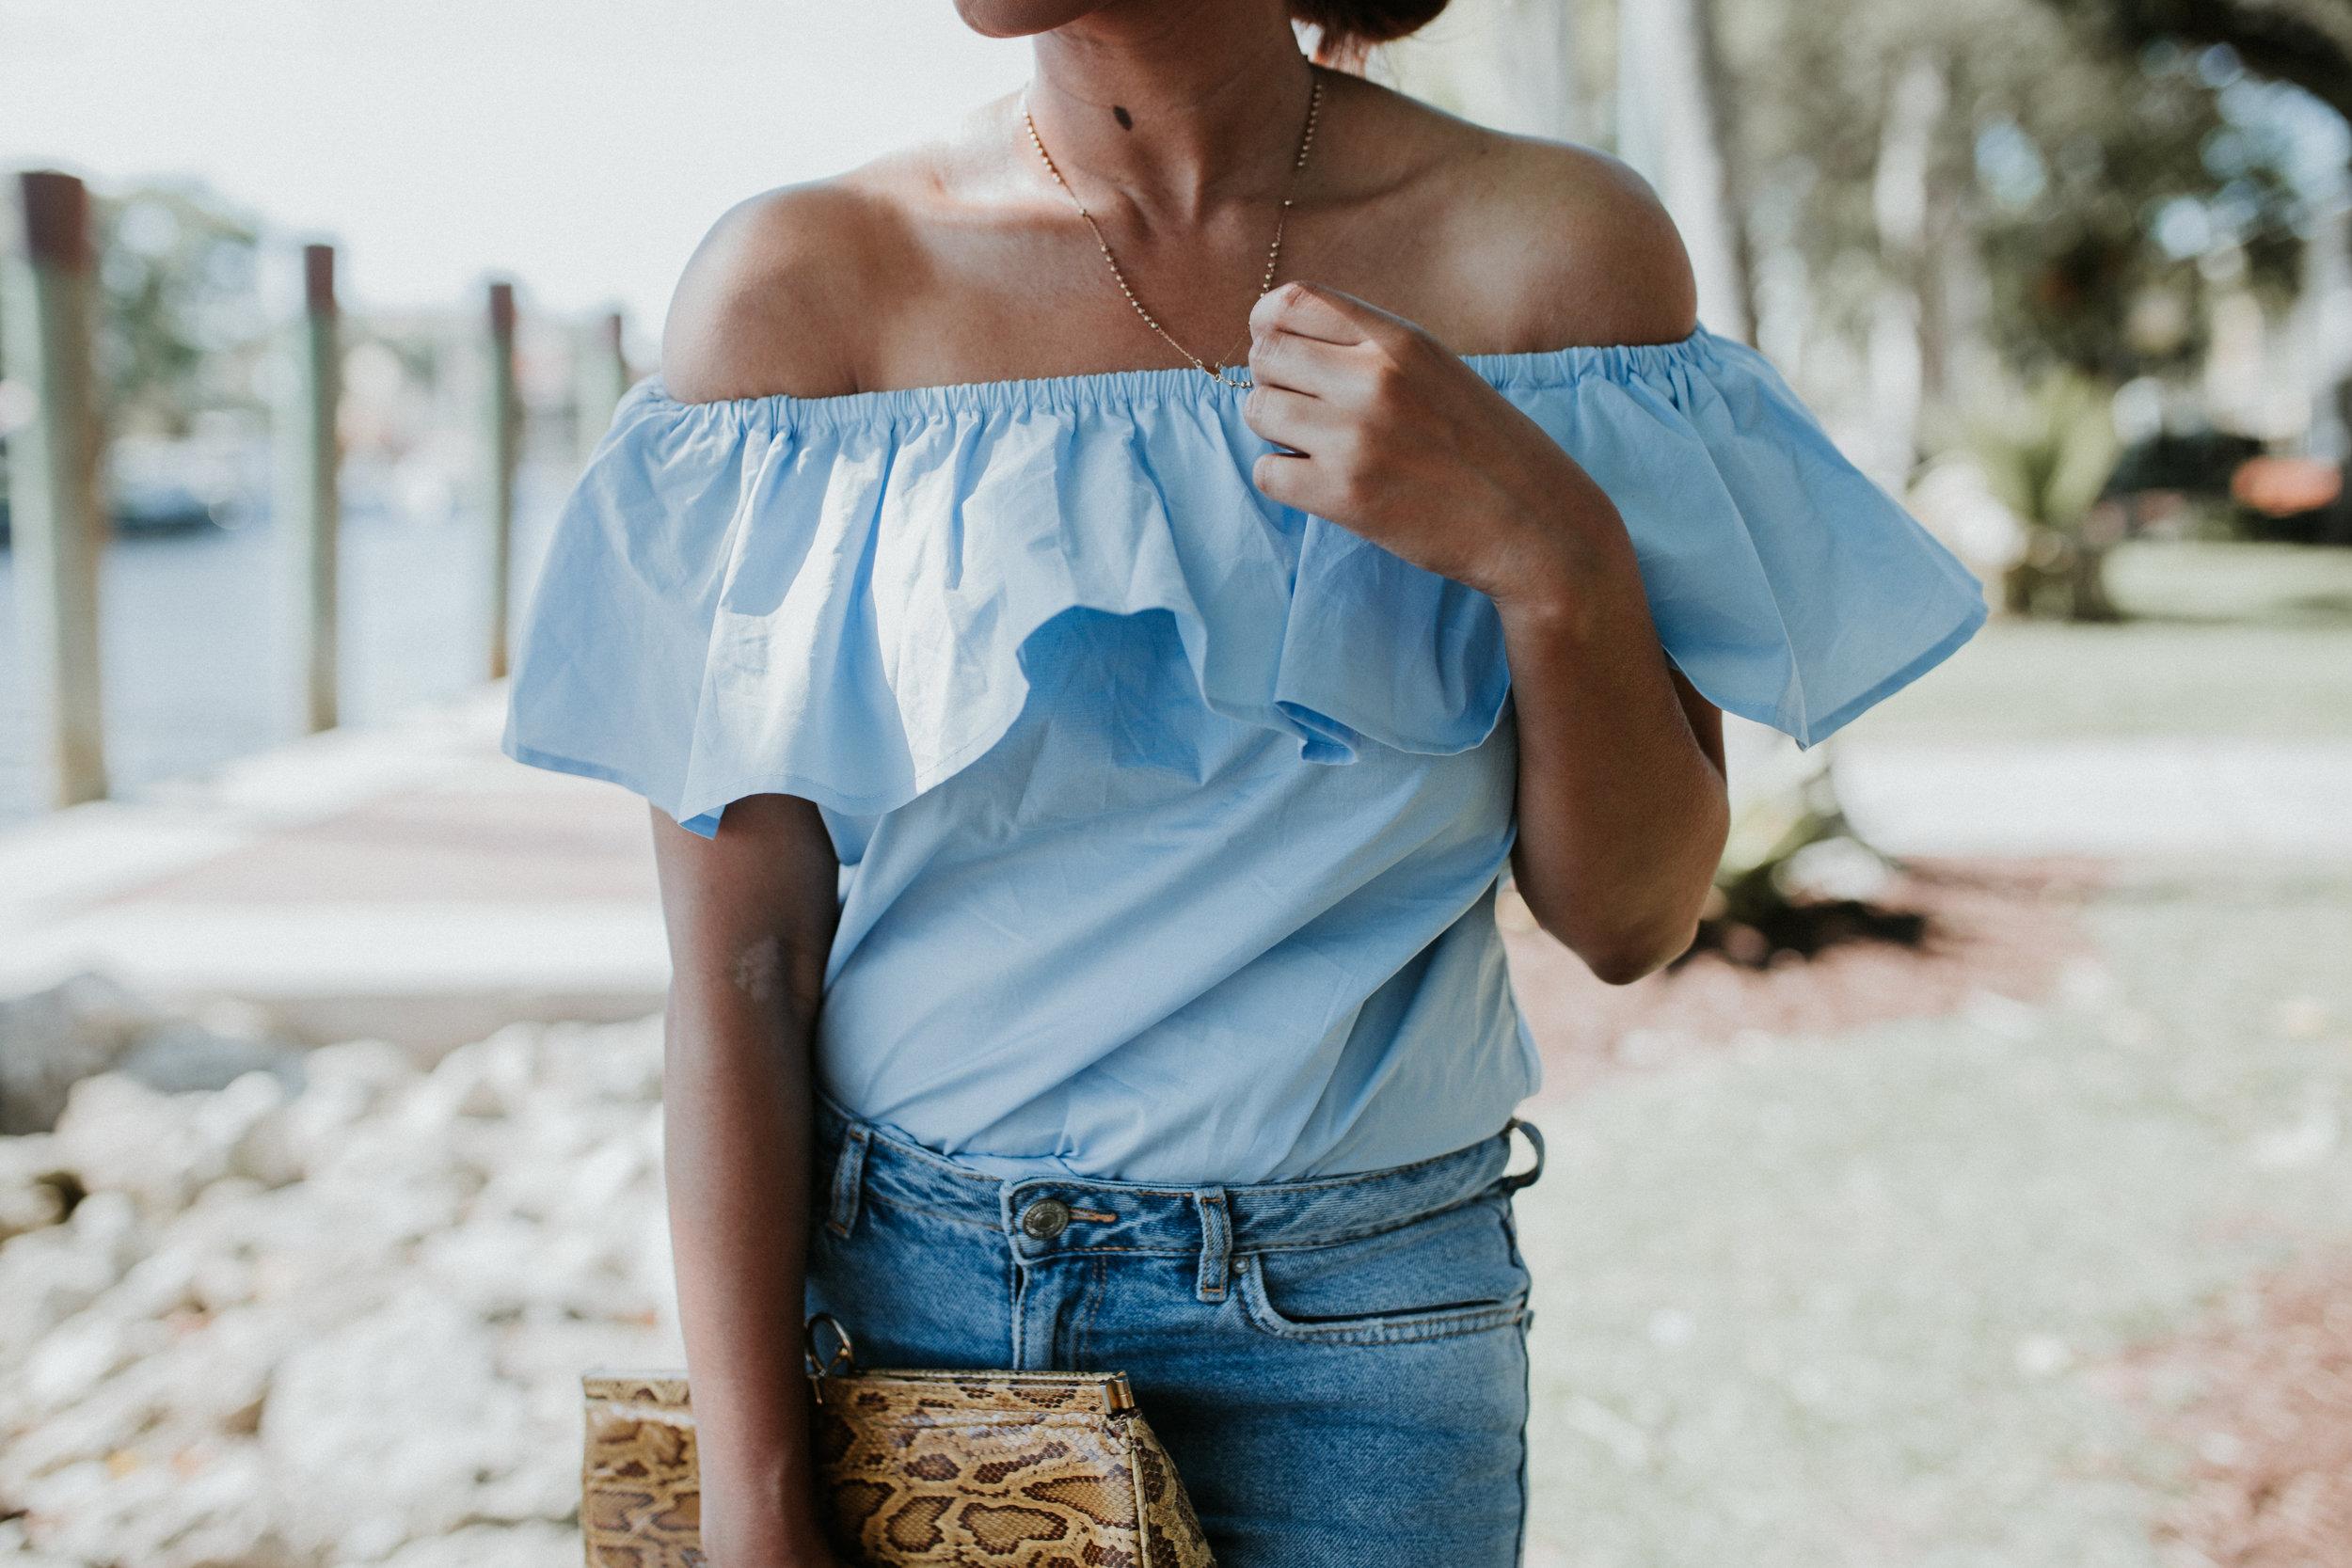 Las olas riverfront, FL fashion blogger